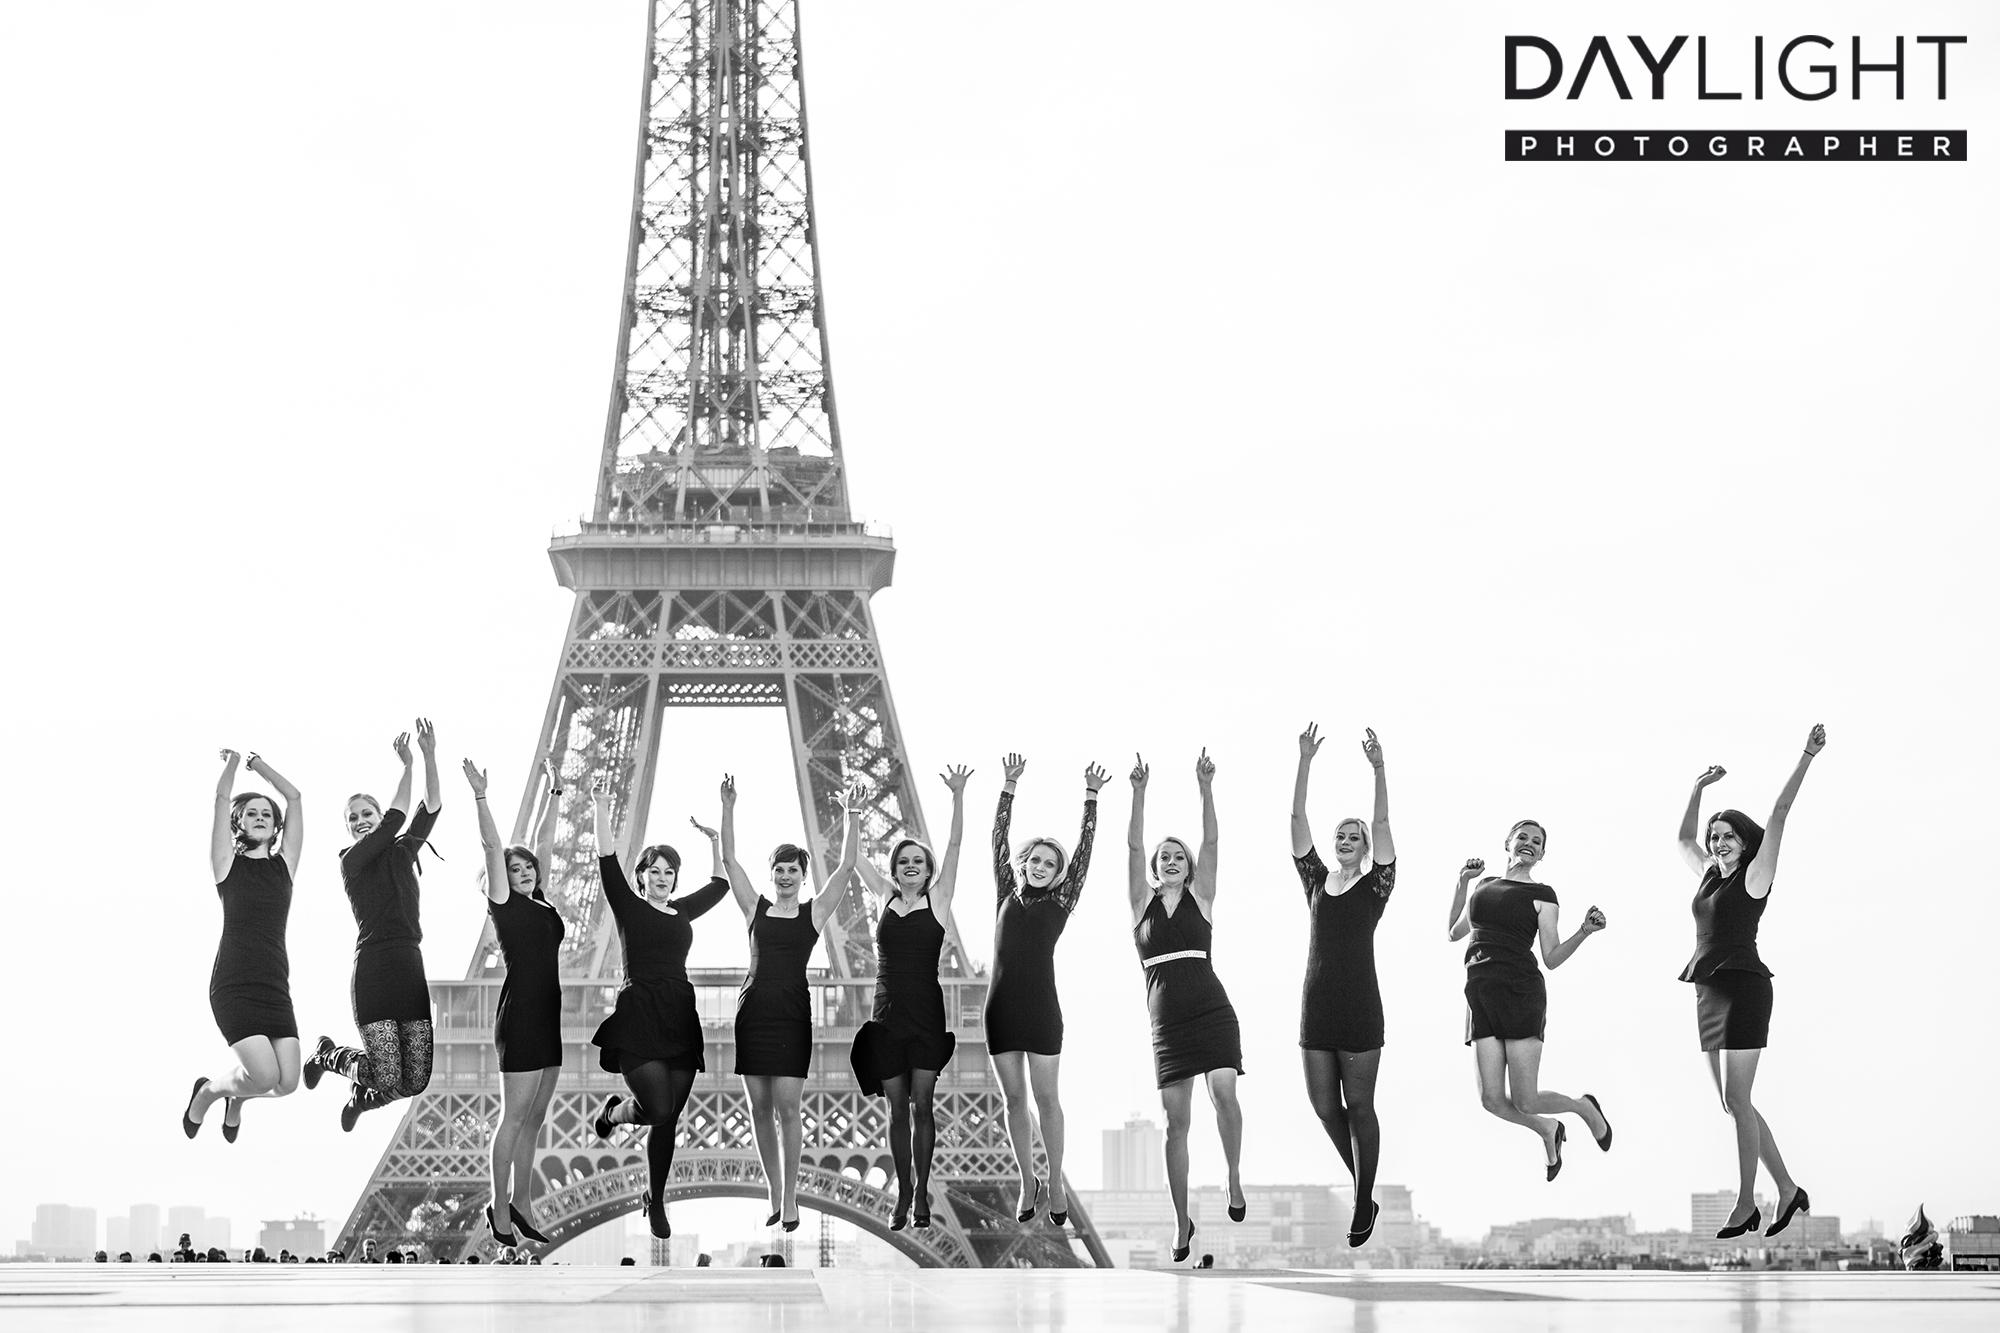 gruppen fotoshooting in paris eiffelturm